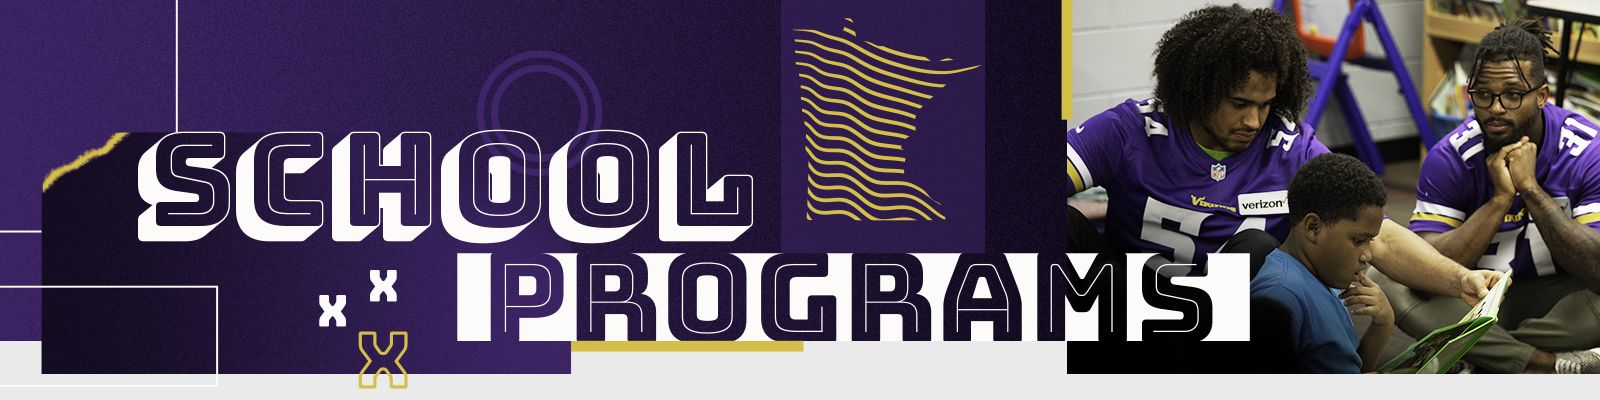 SchoolPrograms_Header_1600x400